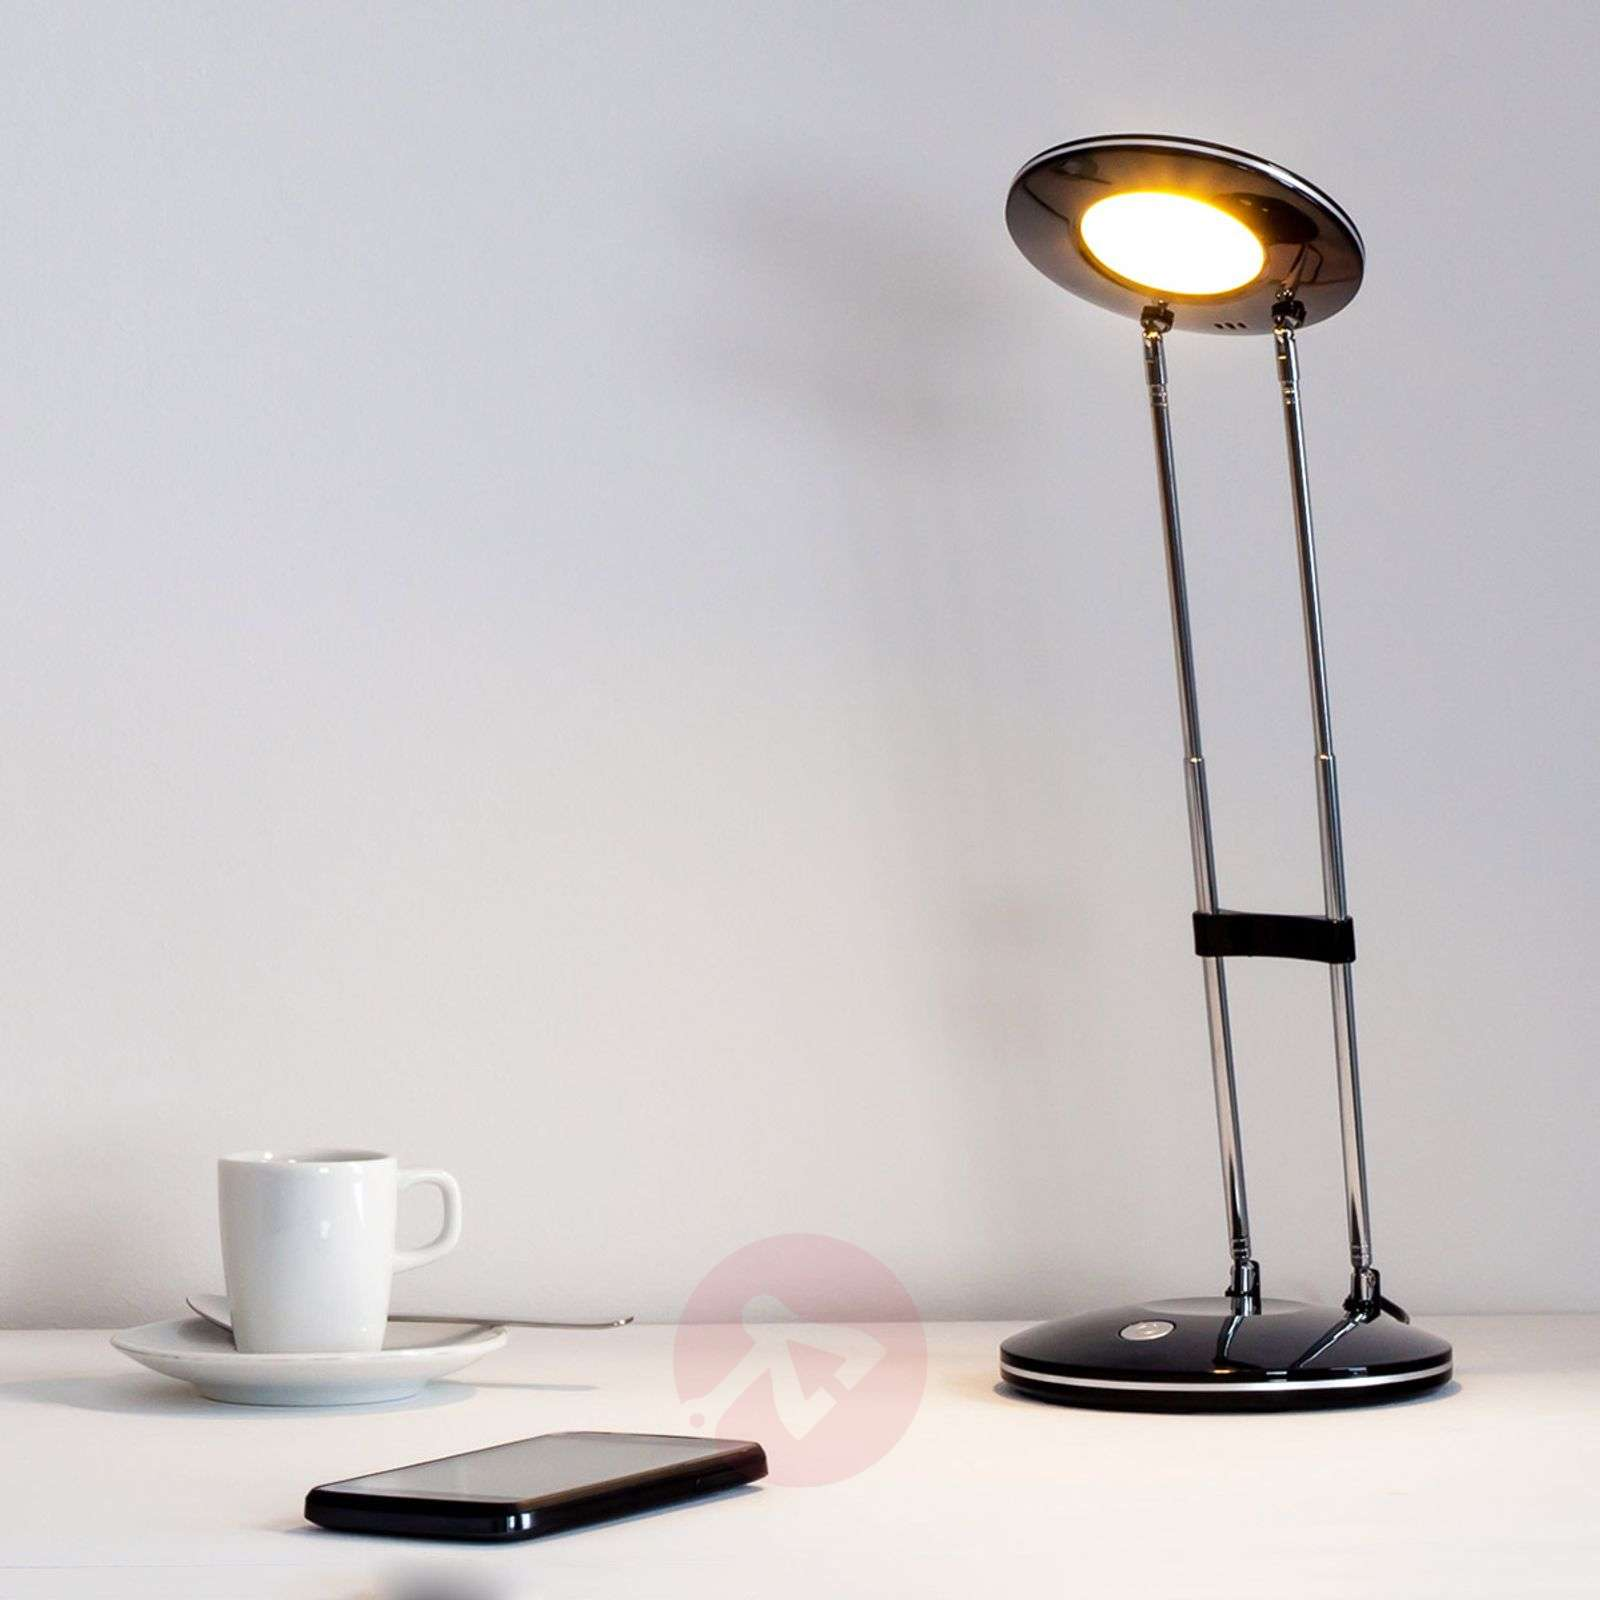 Almina Classical Modern LED Desk Lamp, Black-9643010-01